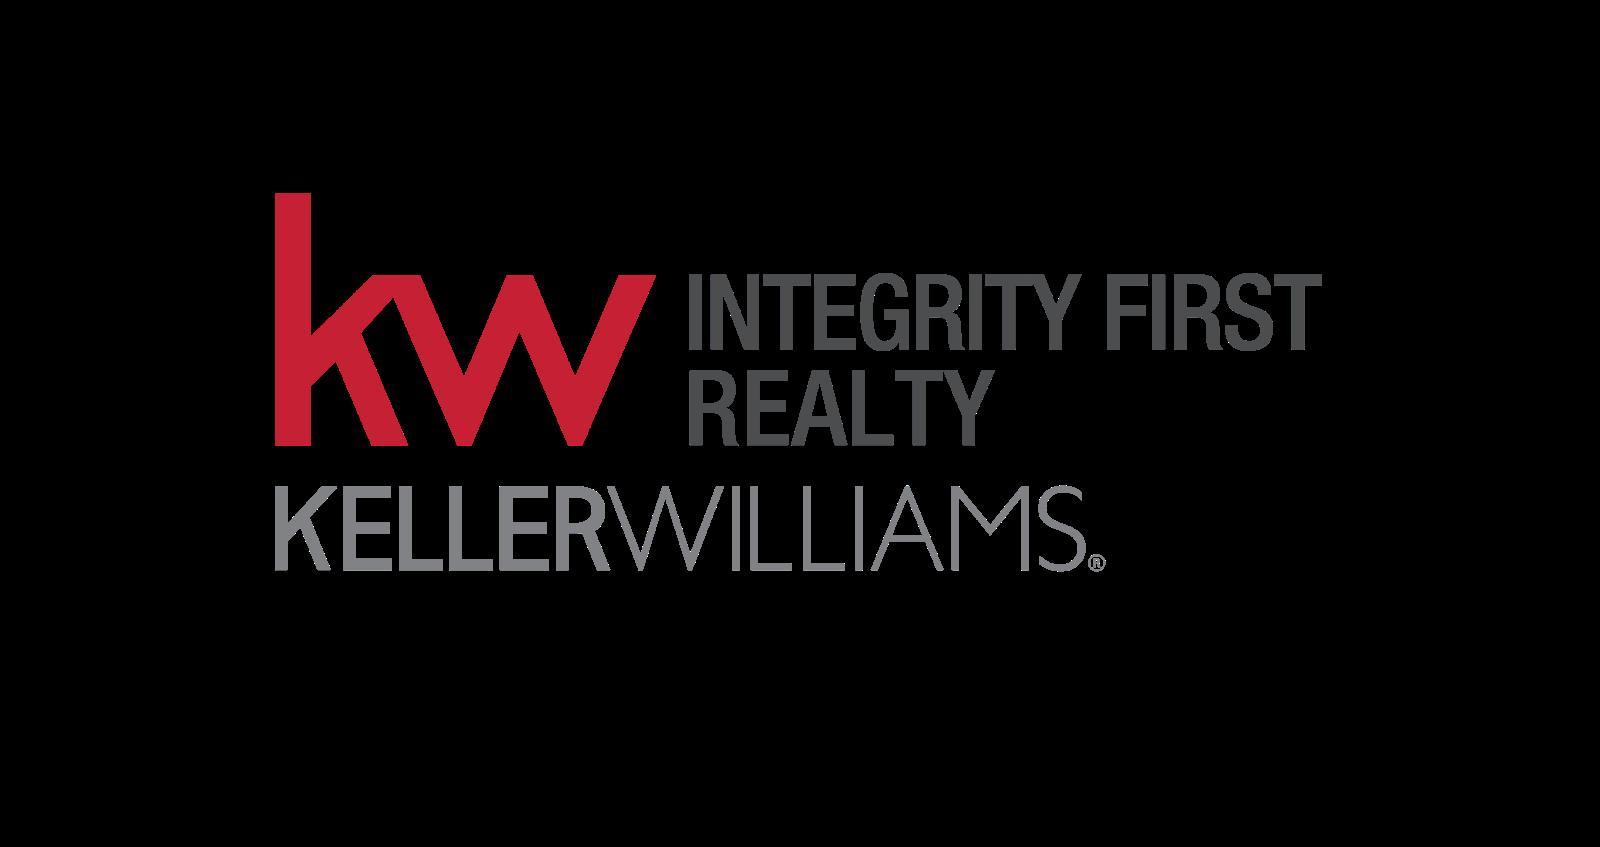 kathleen squillante property solutions associate rh ksquillante kw com keller williams realty logo vector keller williams vector logo download